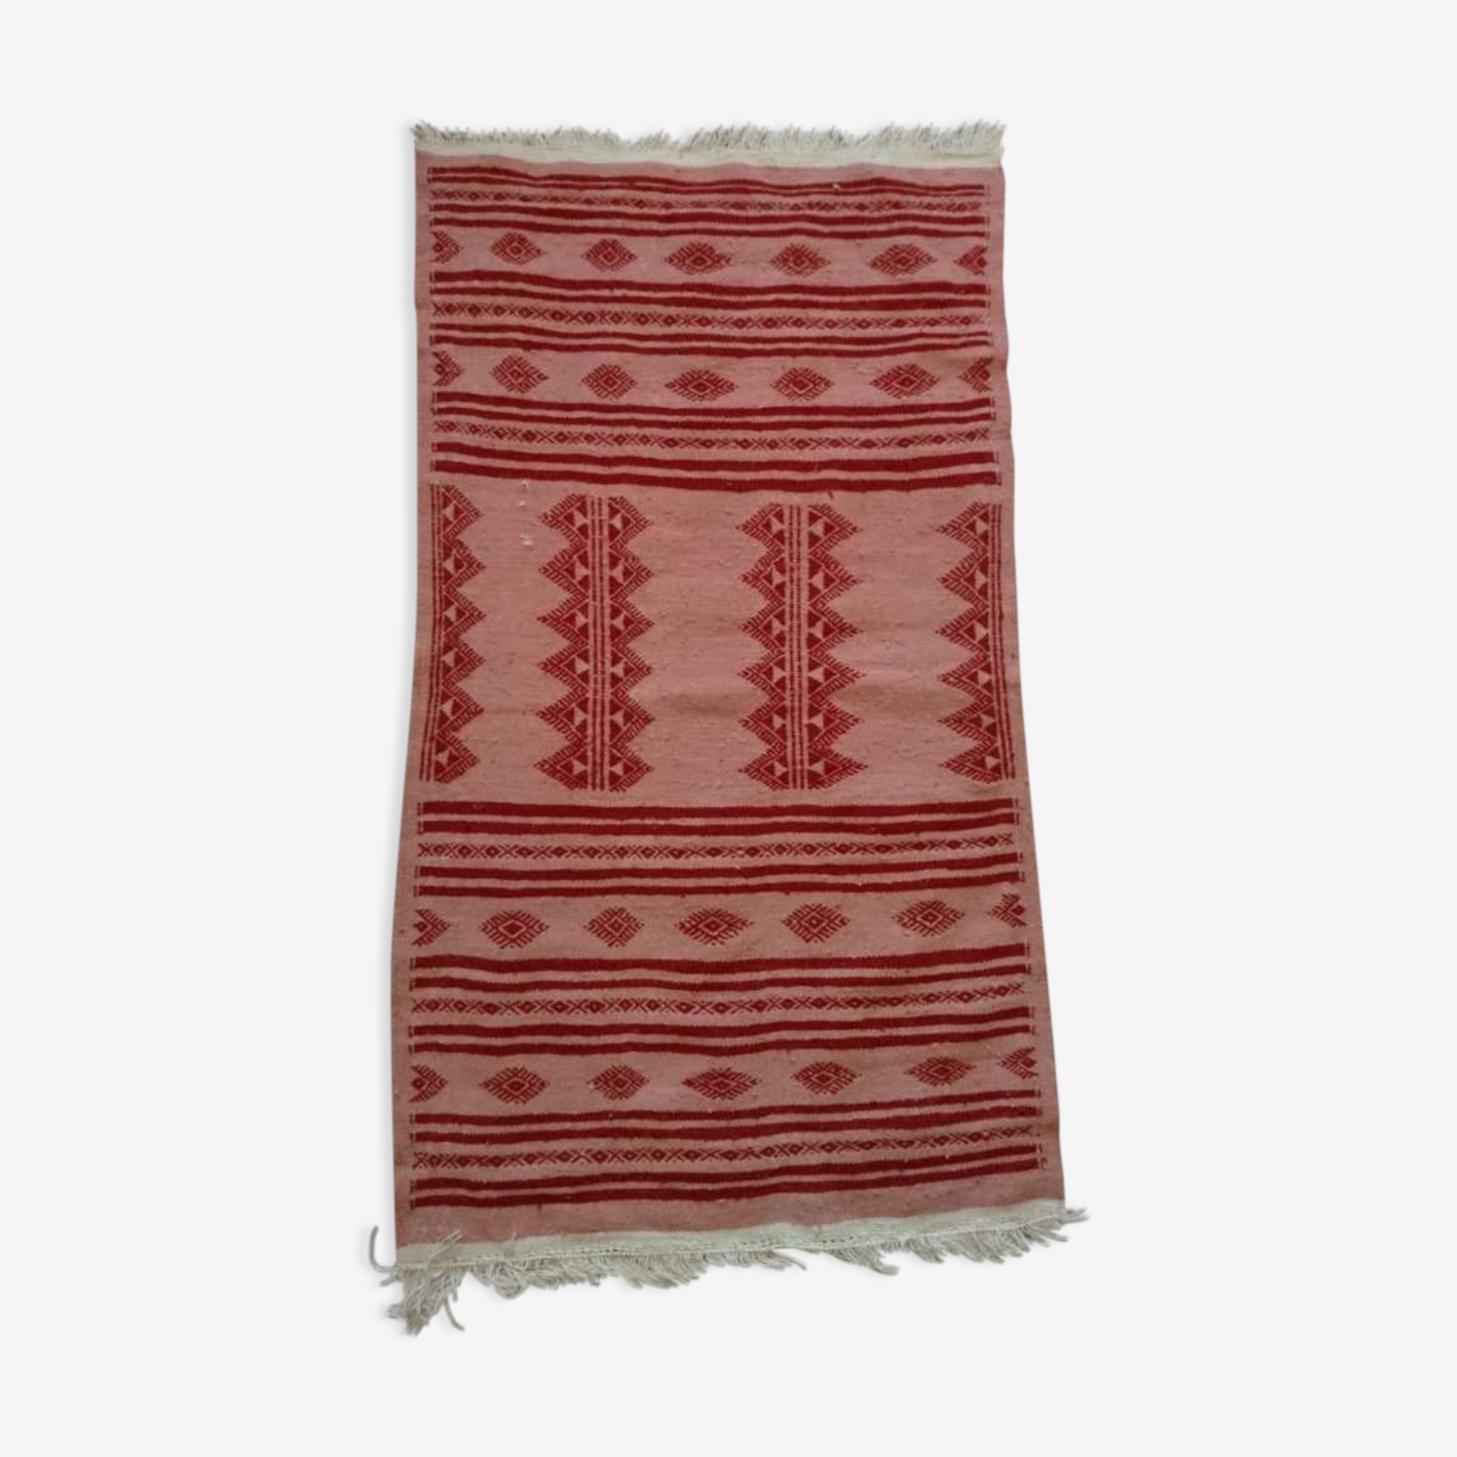 Tapis berbère rose et rouge 110 x 66 cm